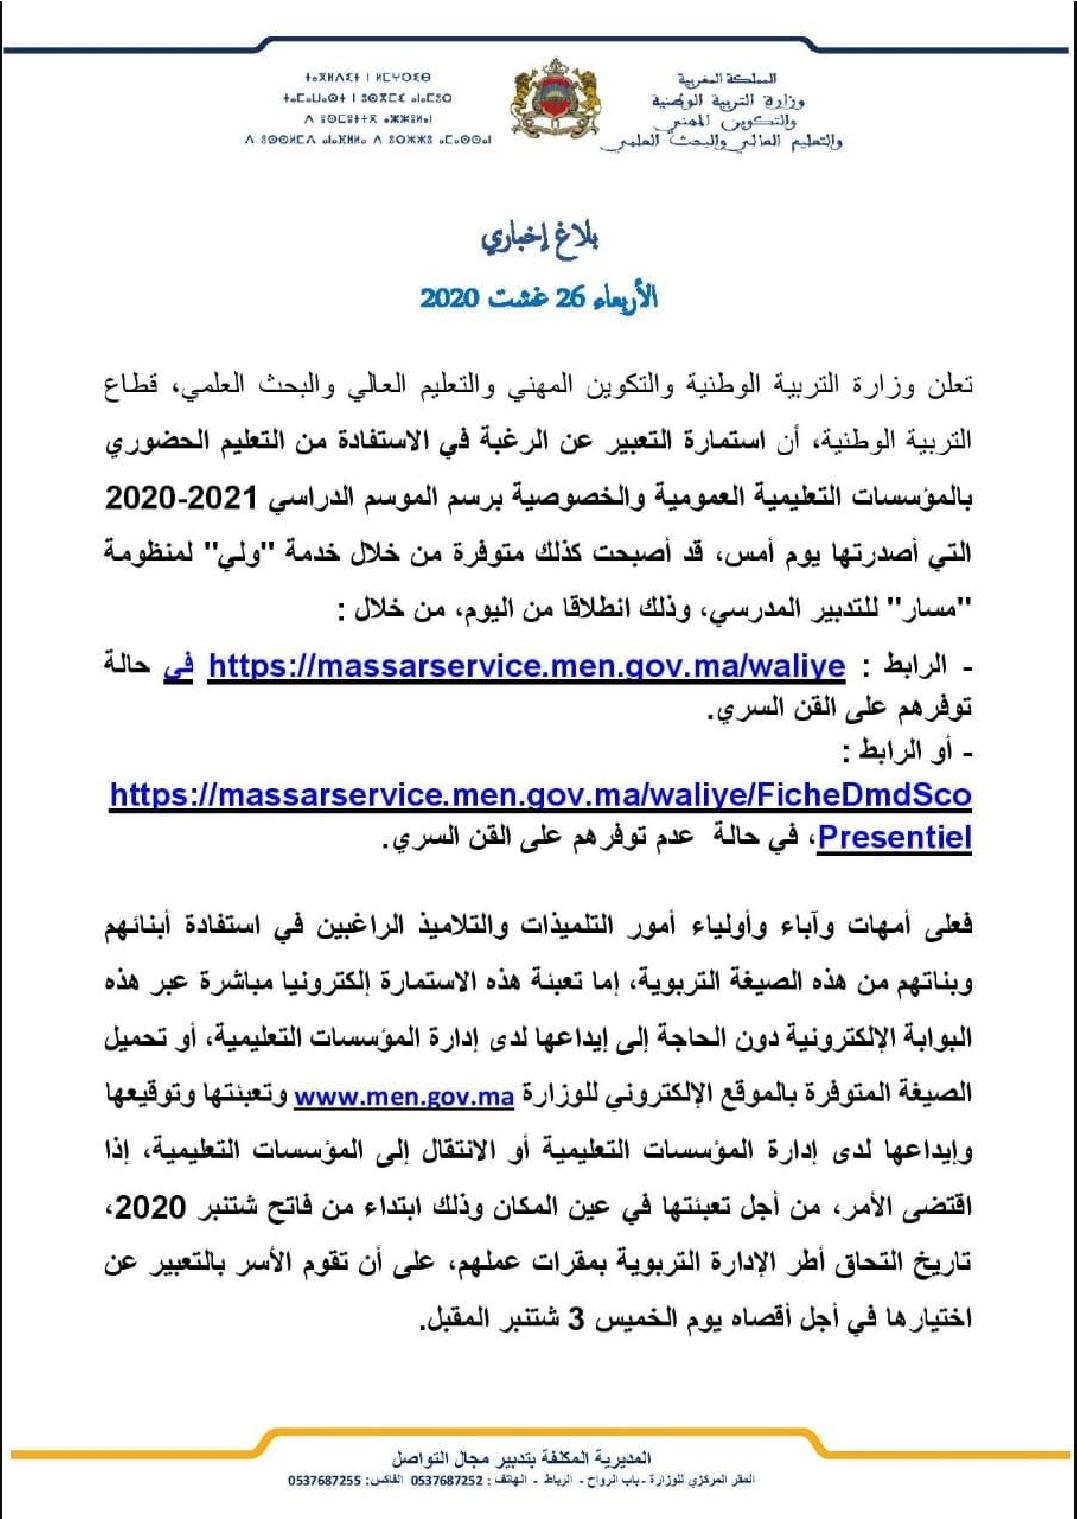 waliye-ملء-استمارة-طلب-الاستفادة-من-التعليم-الحضوري1